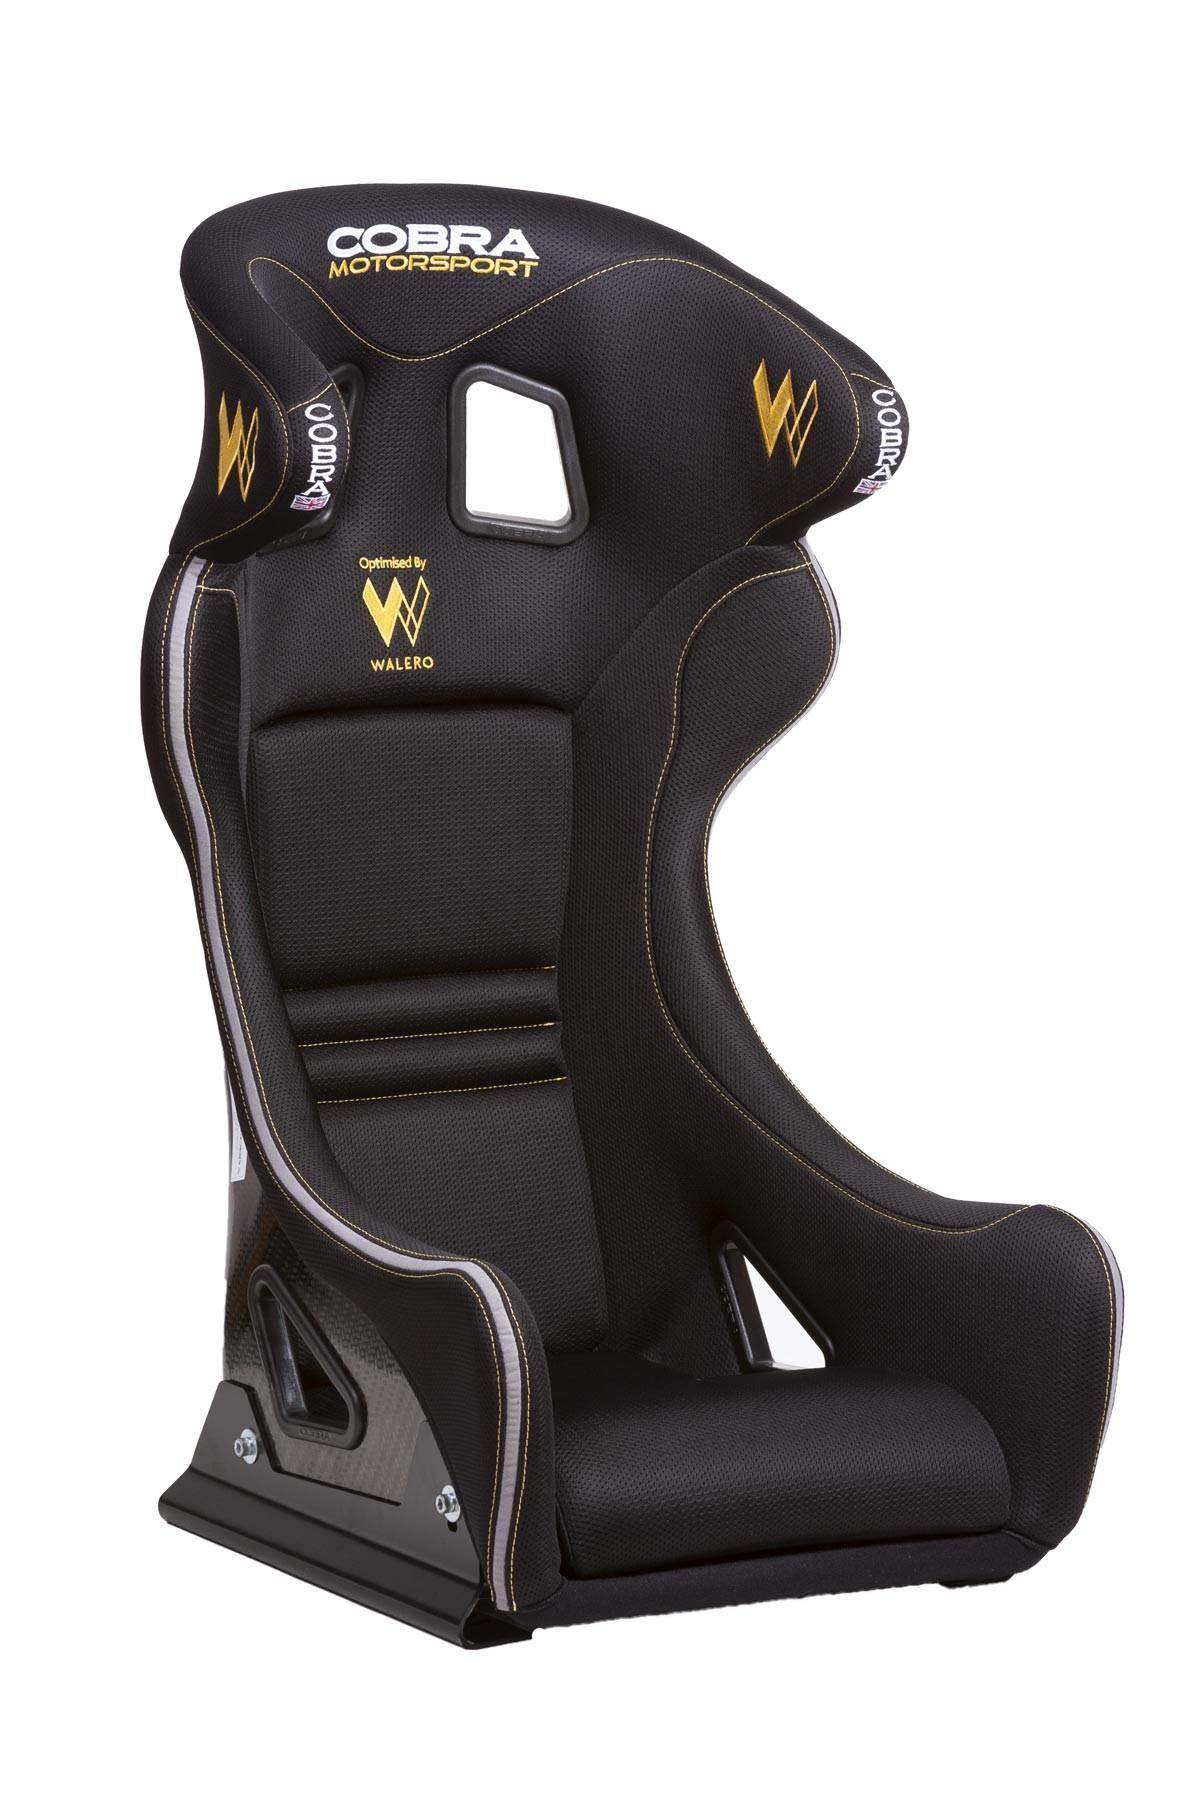 Cobra/Walero Ultralite Race Seat